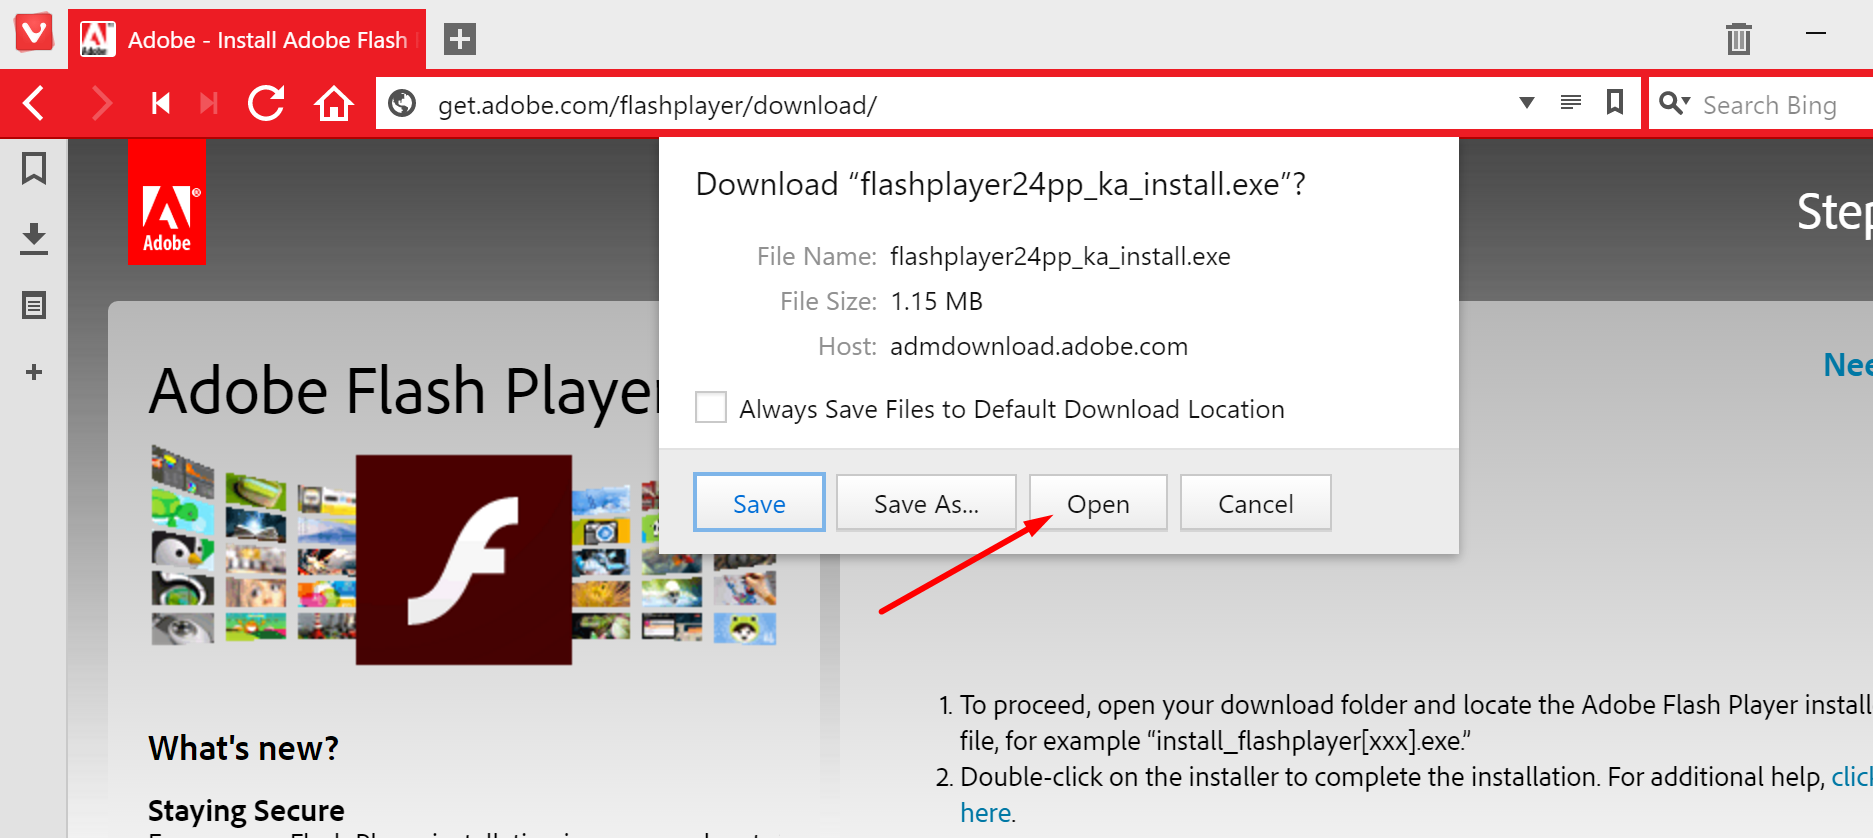 Adobe flash player in tor browser gidra не соединяется с сетью тор браузер hyrda